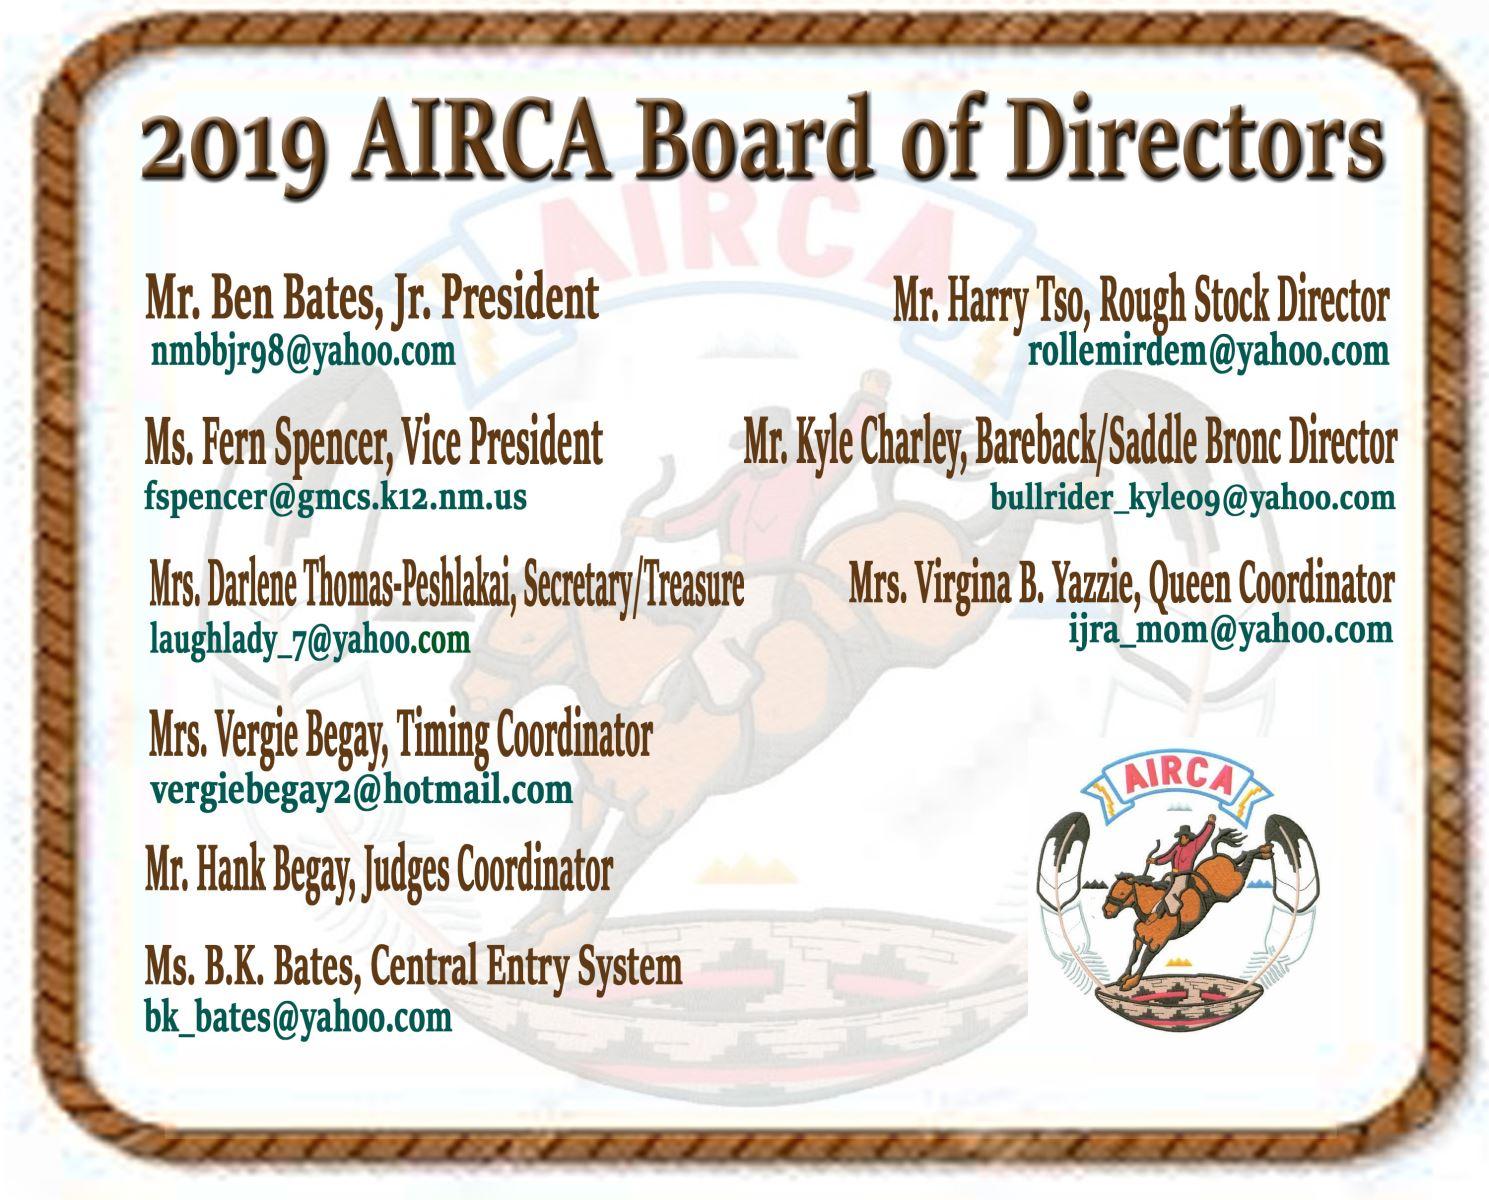 2019 AIRCA Board of Directors